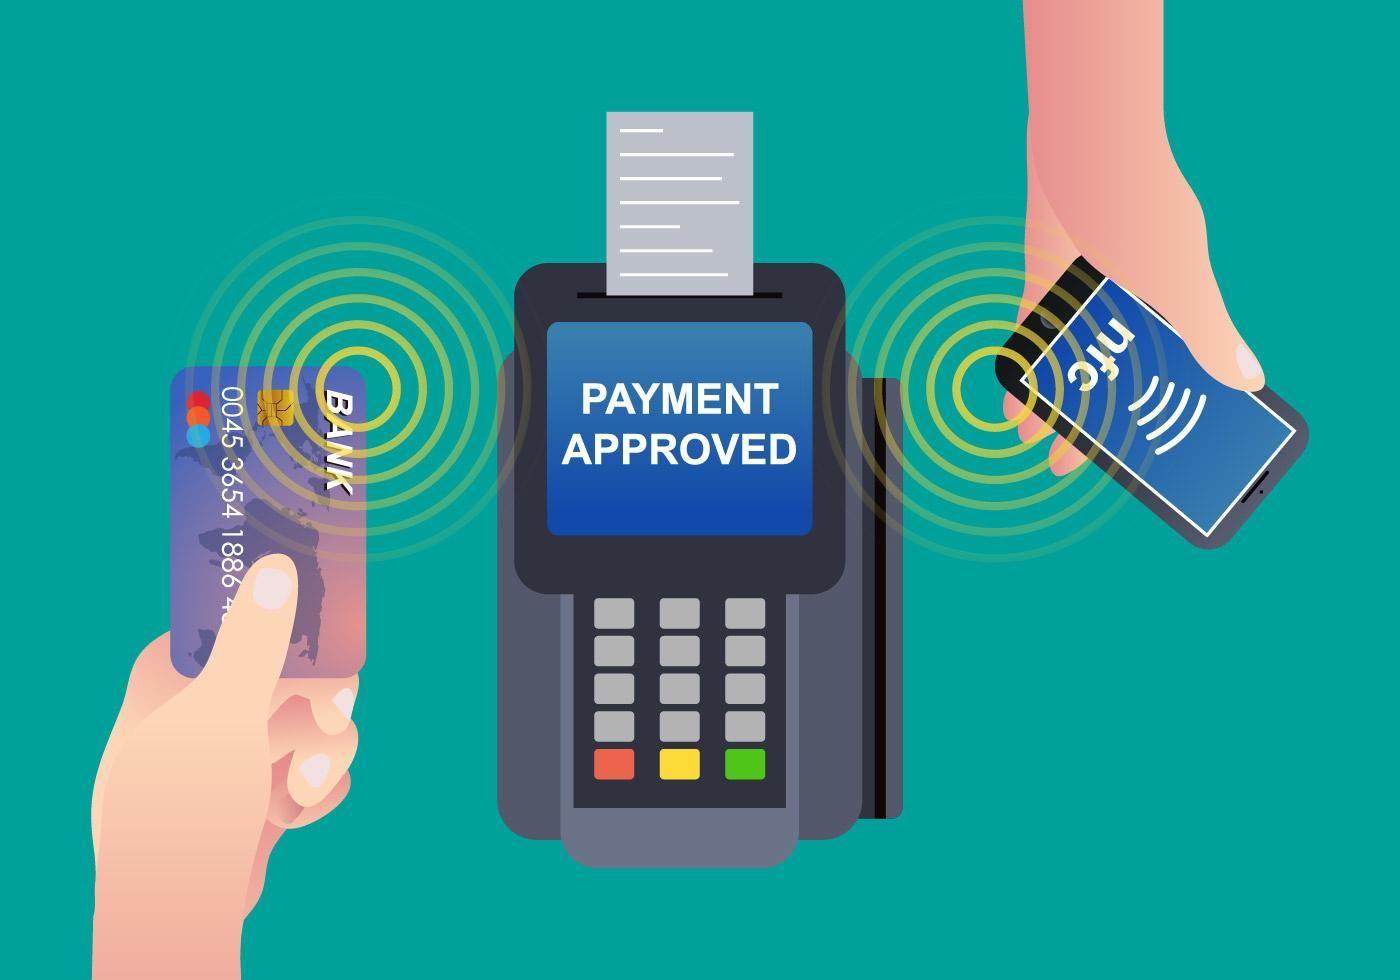 NFC Payment Vector Обои, Логотип